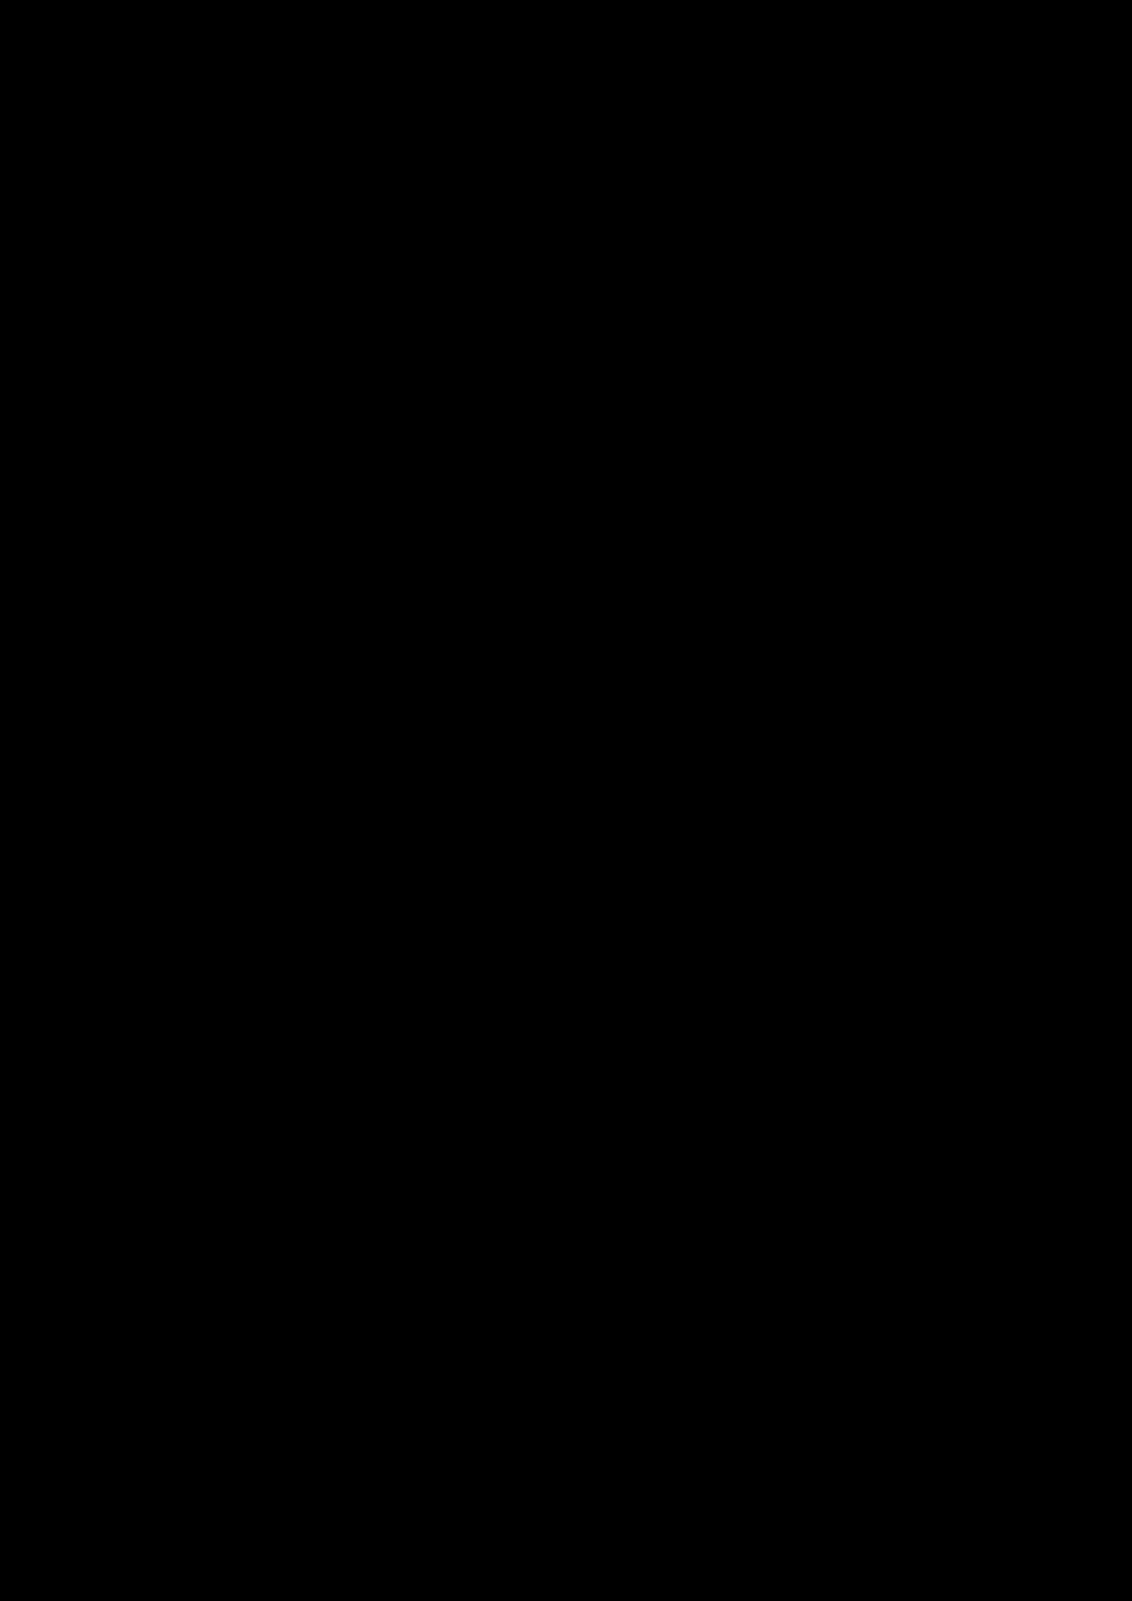 Prosti slide, Image 3